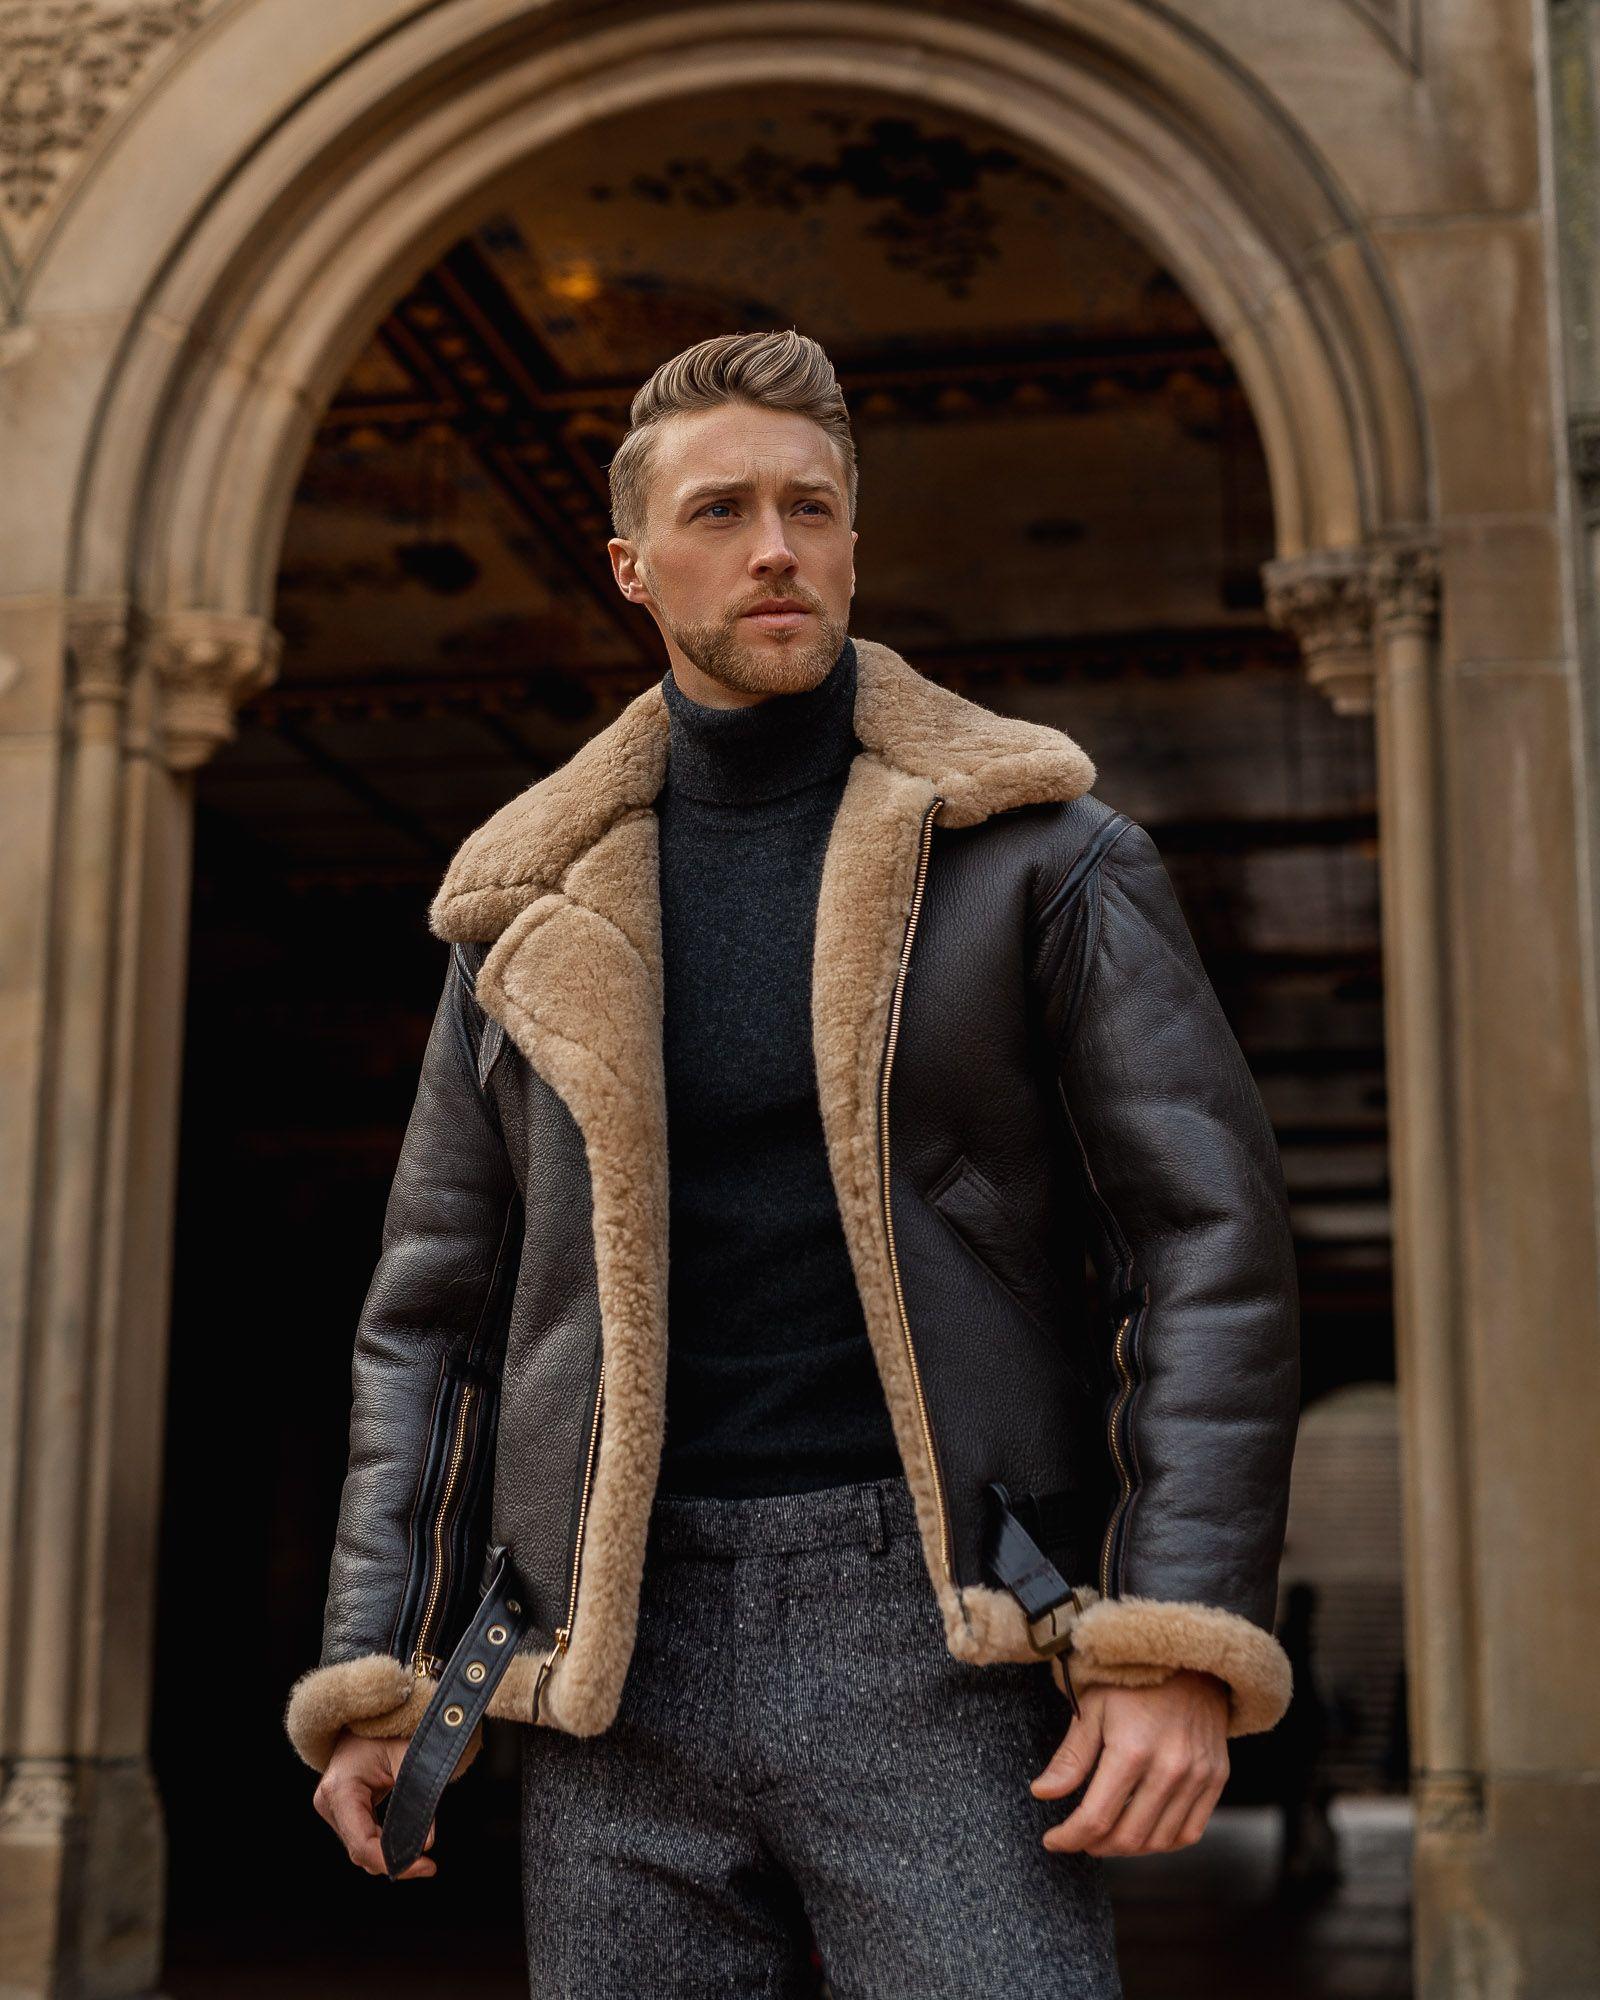 R A F Sheepskin Bomber Jacket Z2109 Mens Shearling Jacket Stylish Mens Outfits Mens Winter Fashion [ 2000 x 1600 Pixel ]